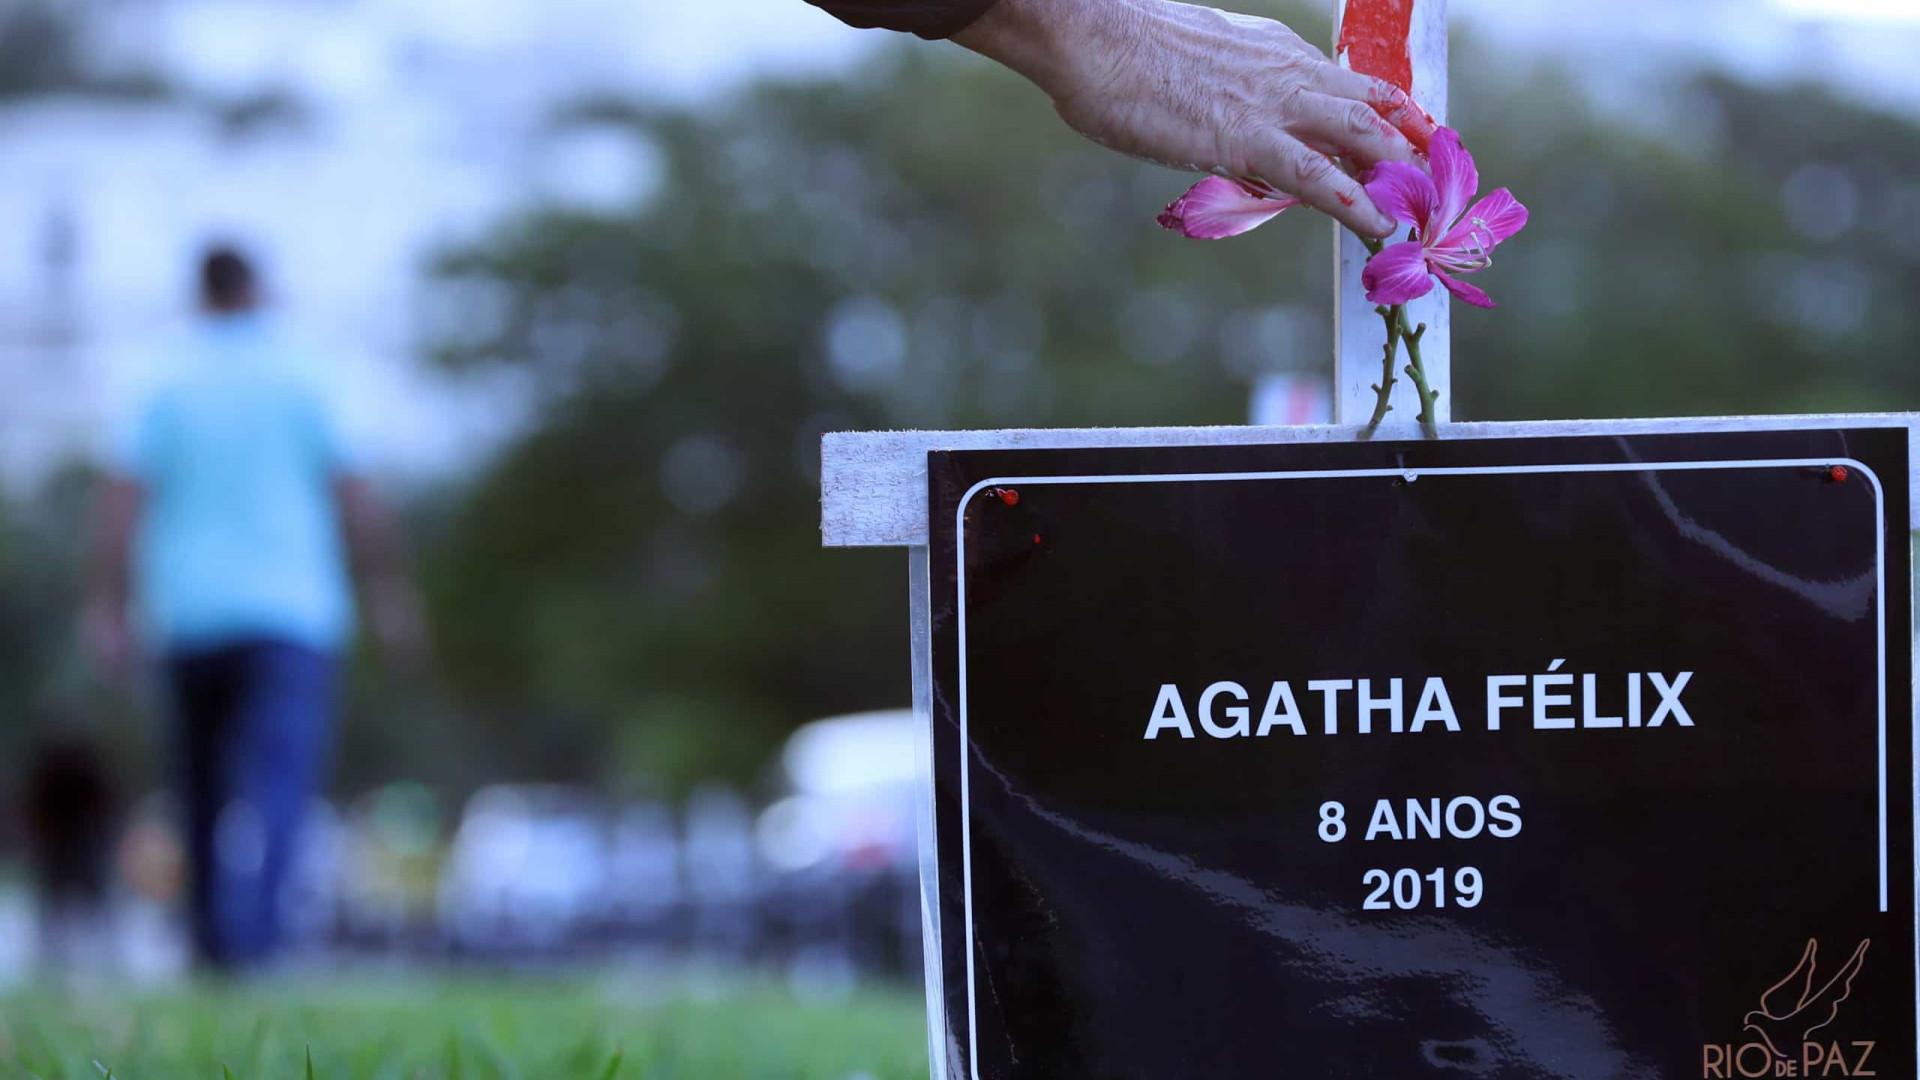 Witzel manda apurar se PMs tentaram pegar bala que matou Ágatha